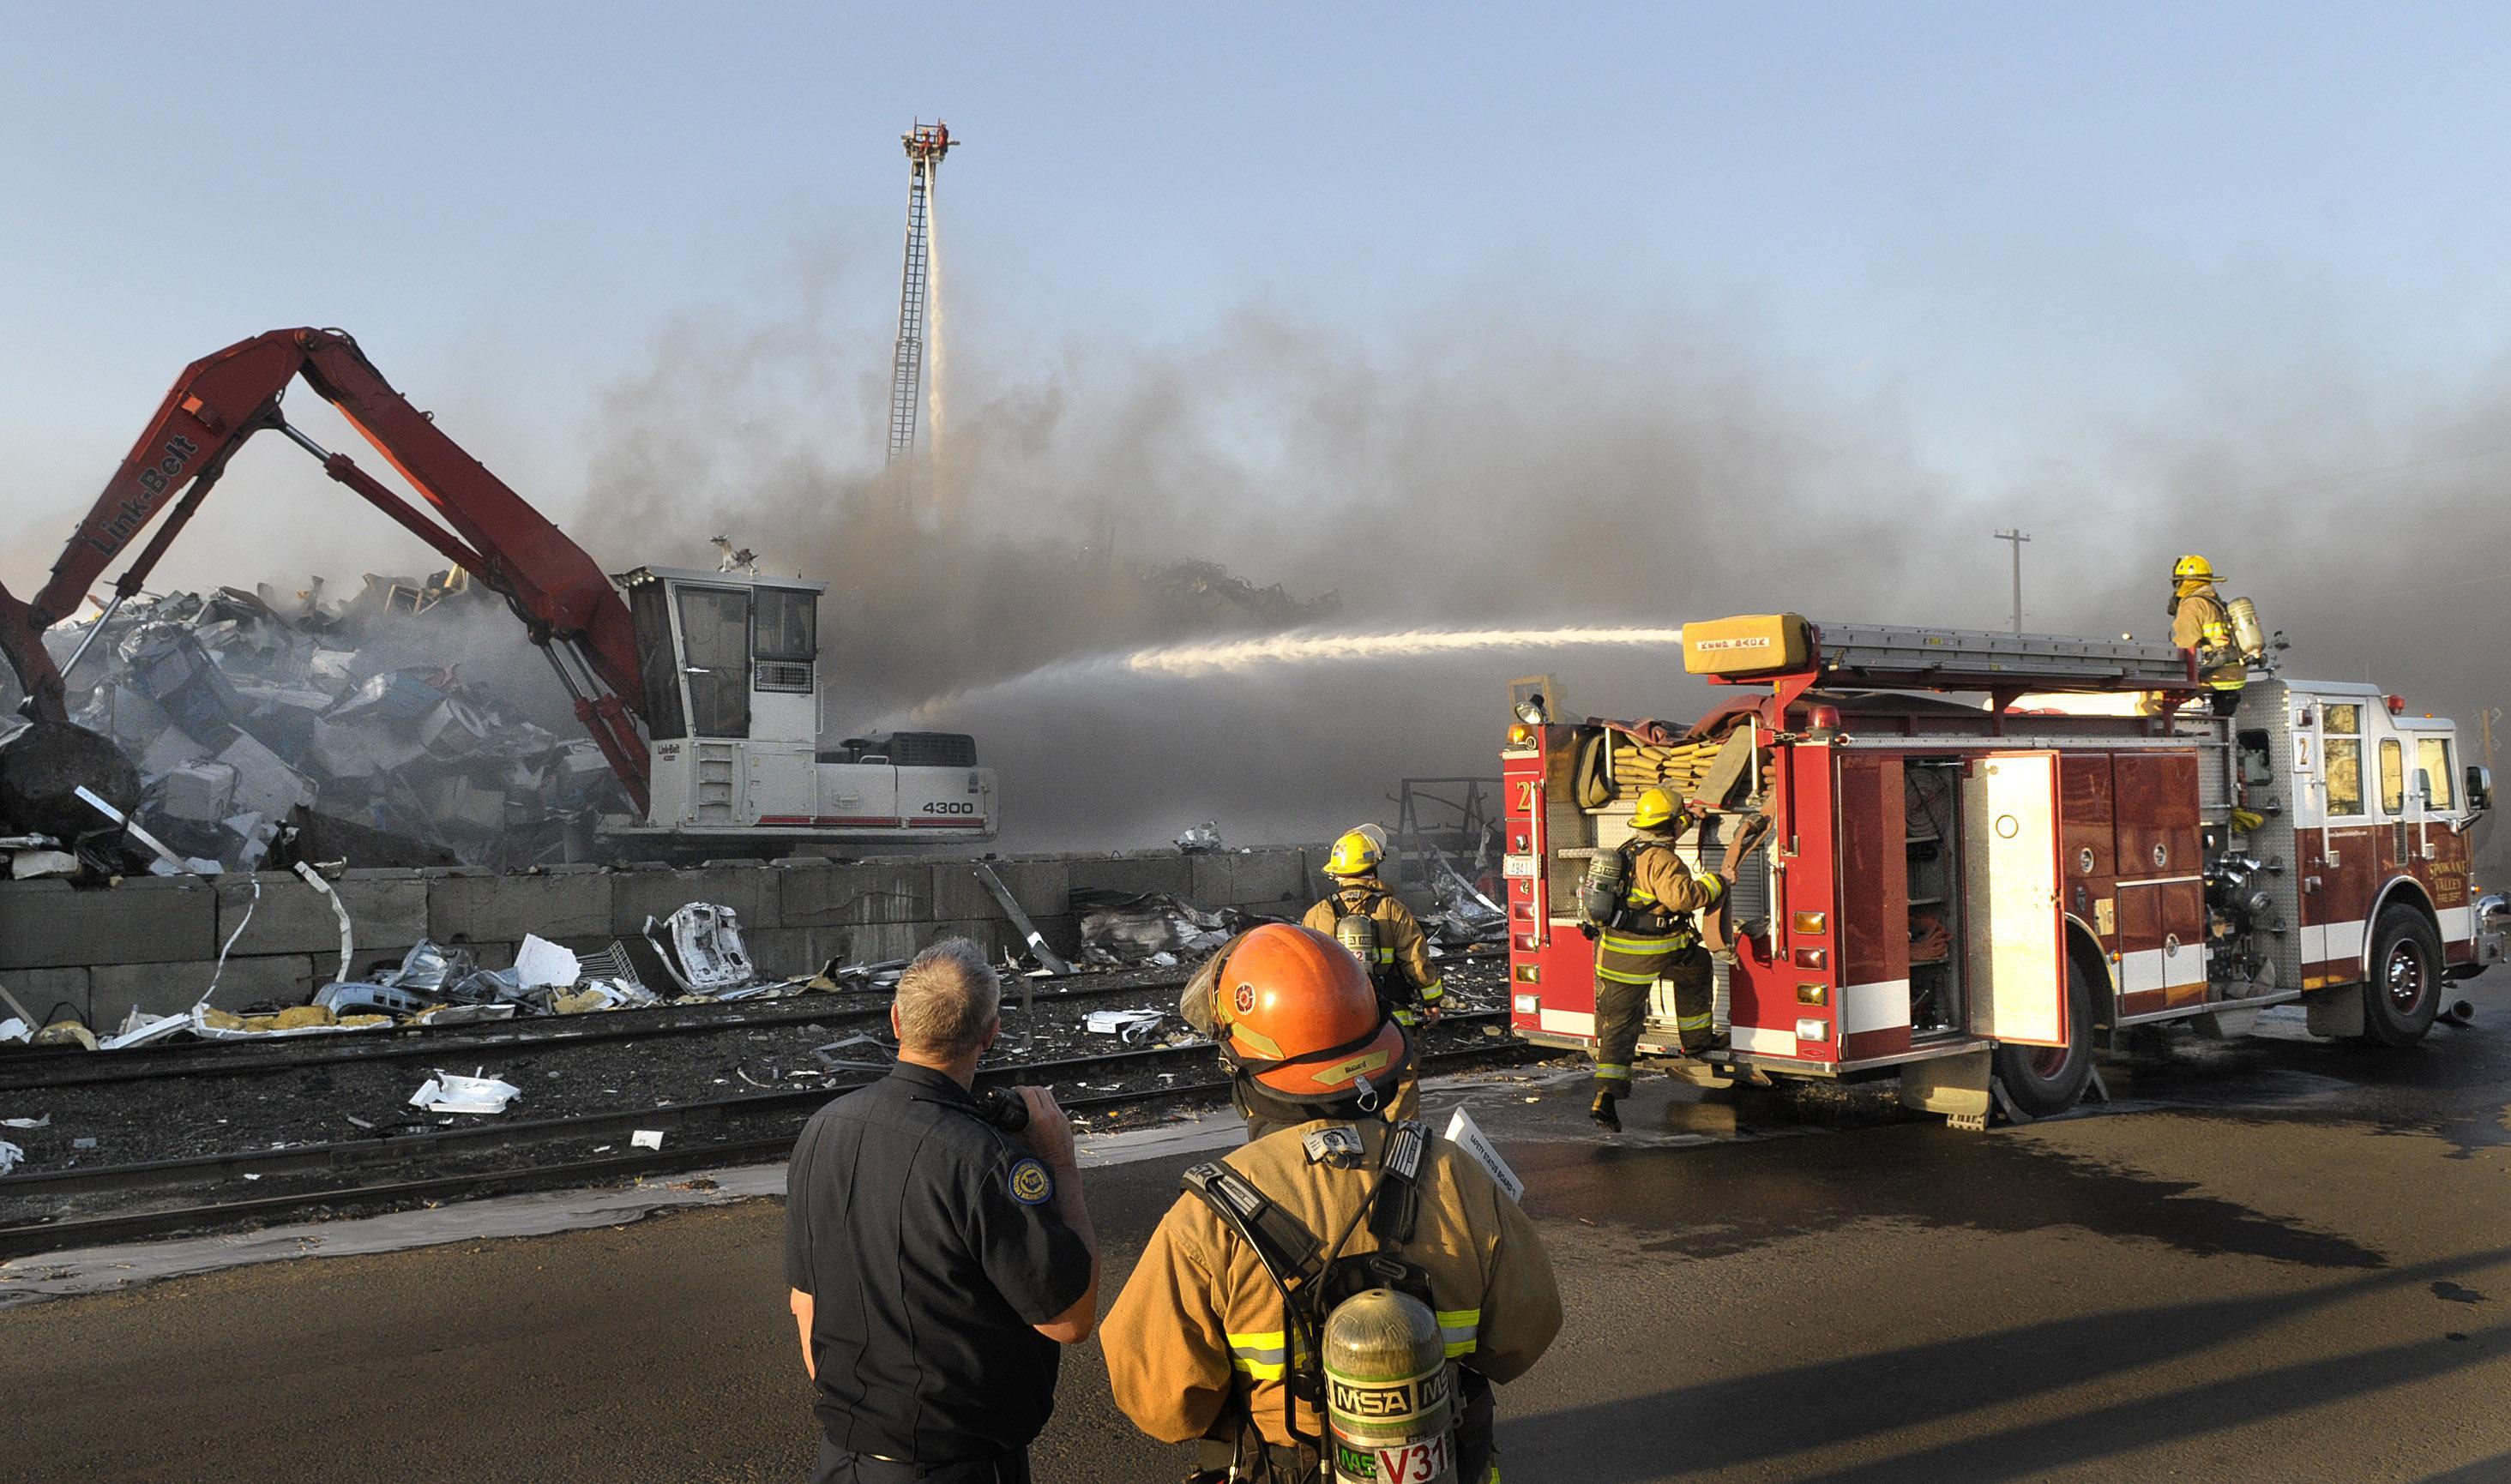 Cutting torch starts fire in large scrap pile at Spokane